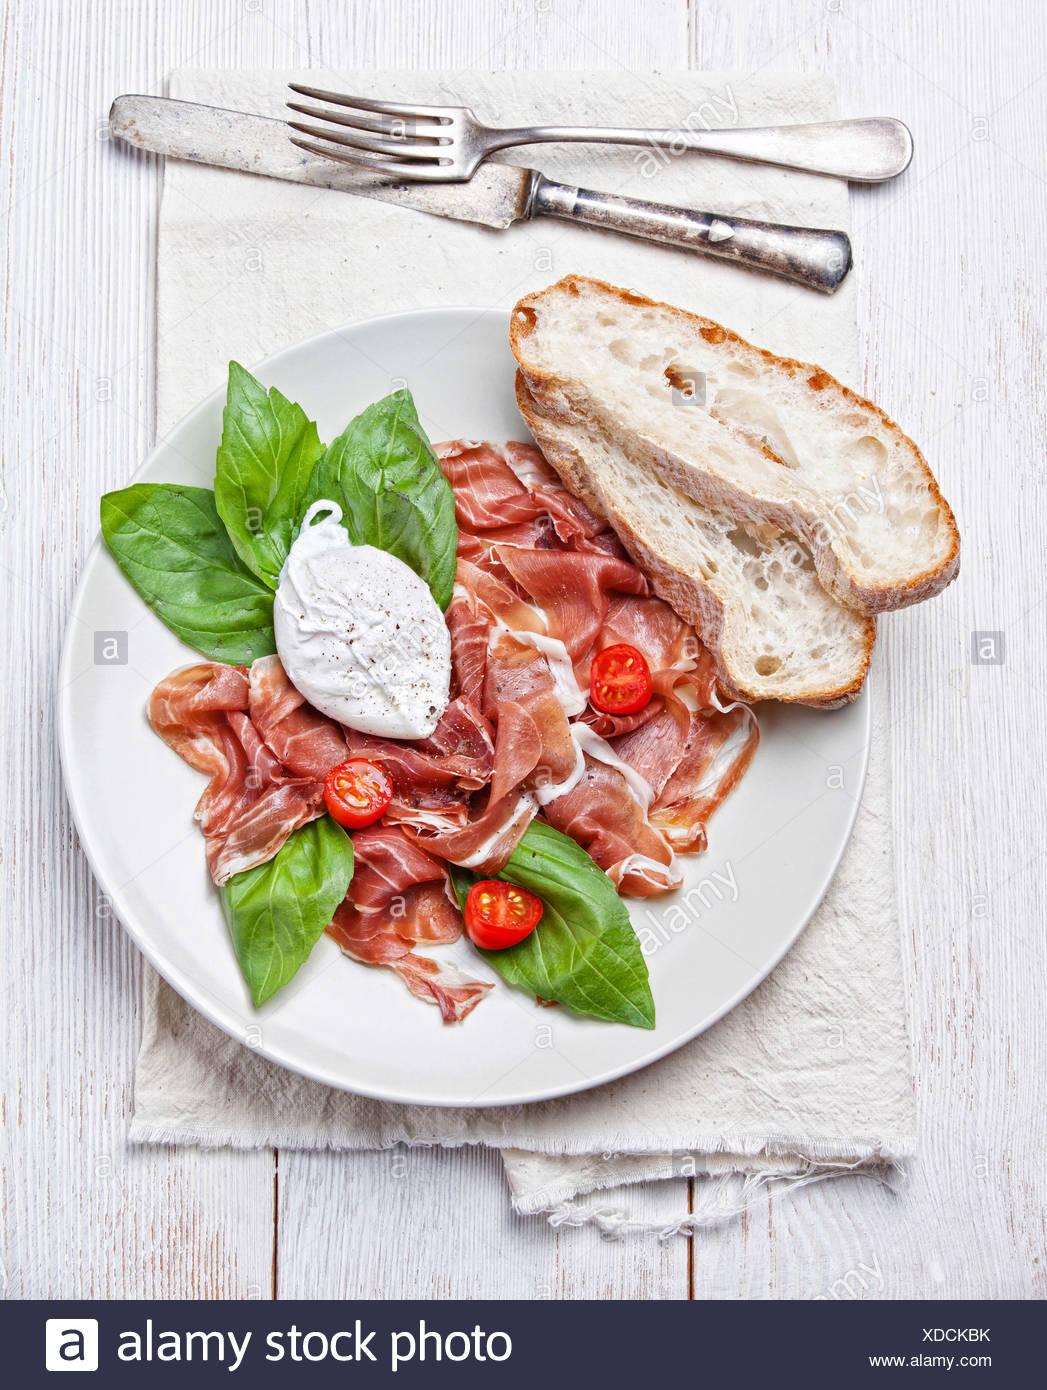 Salade de jambon avec œuf poché Photo Stock